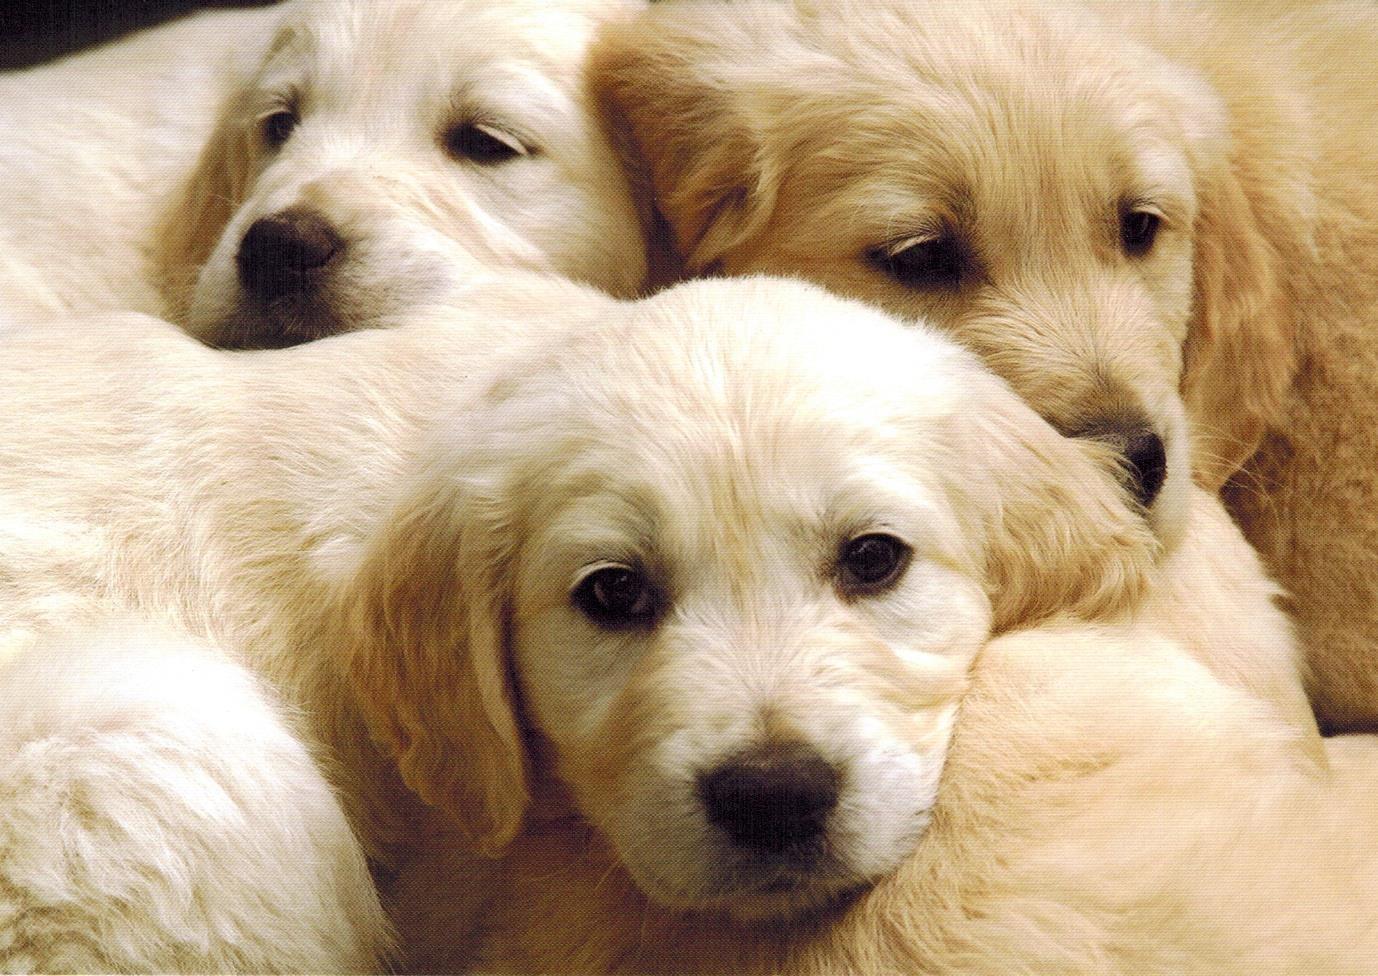 Three Blonde Puppies Dog Breeds Medium Pet Store Puppies Cute Dogs